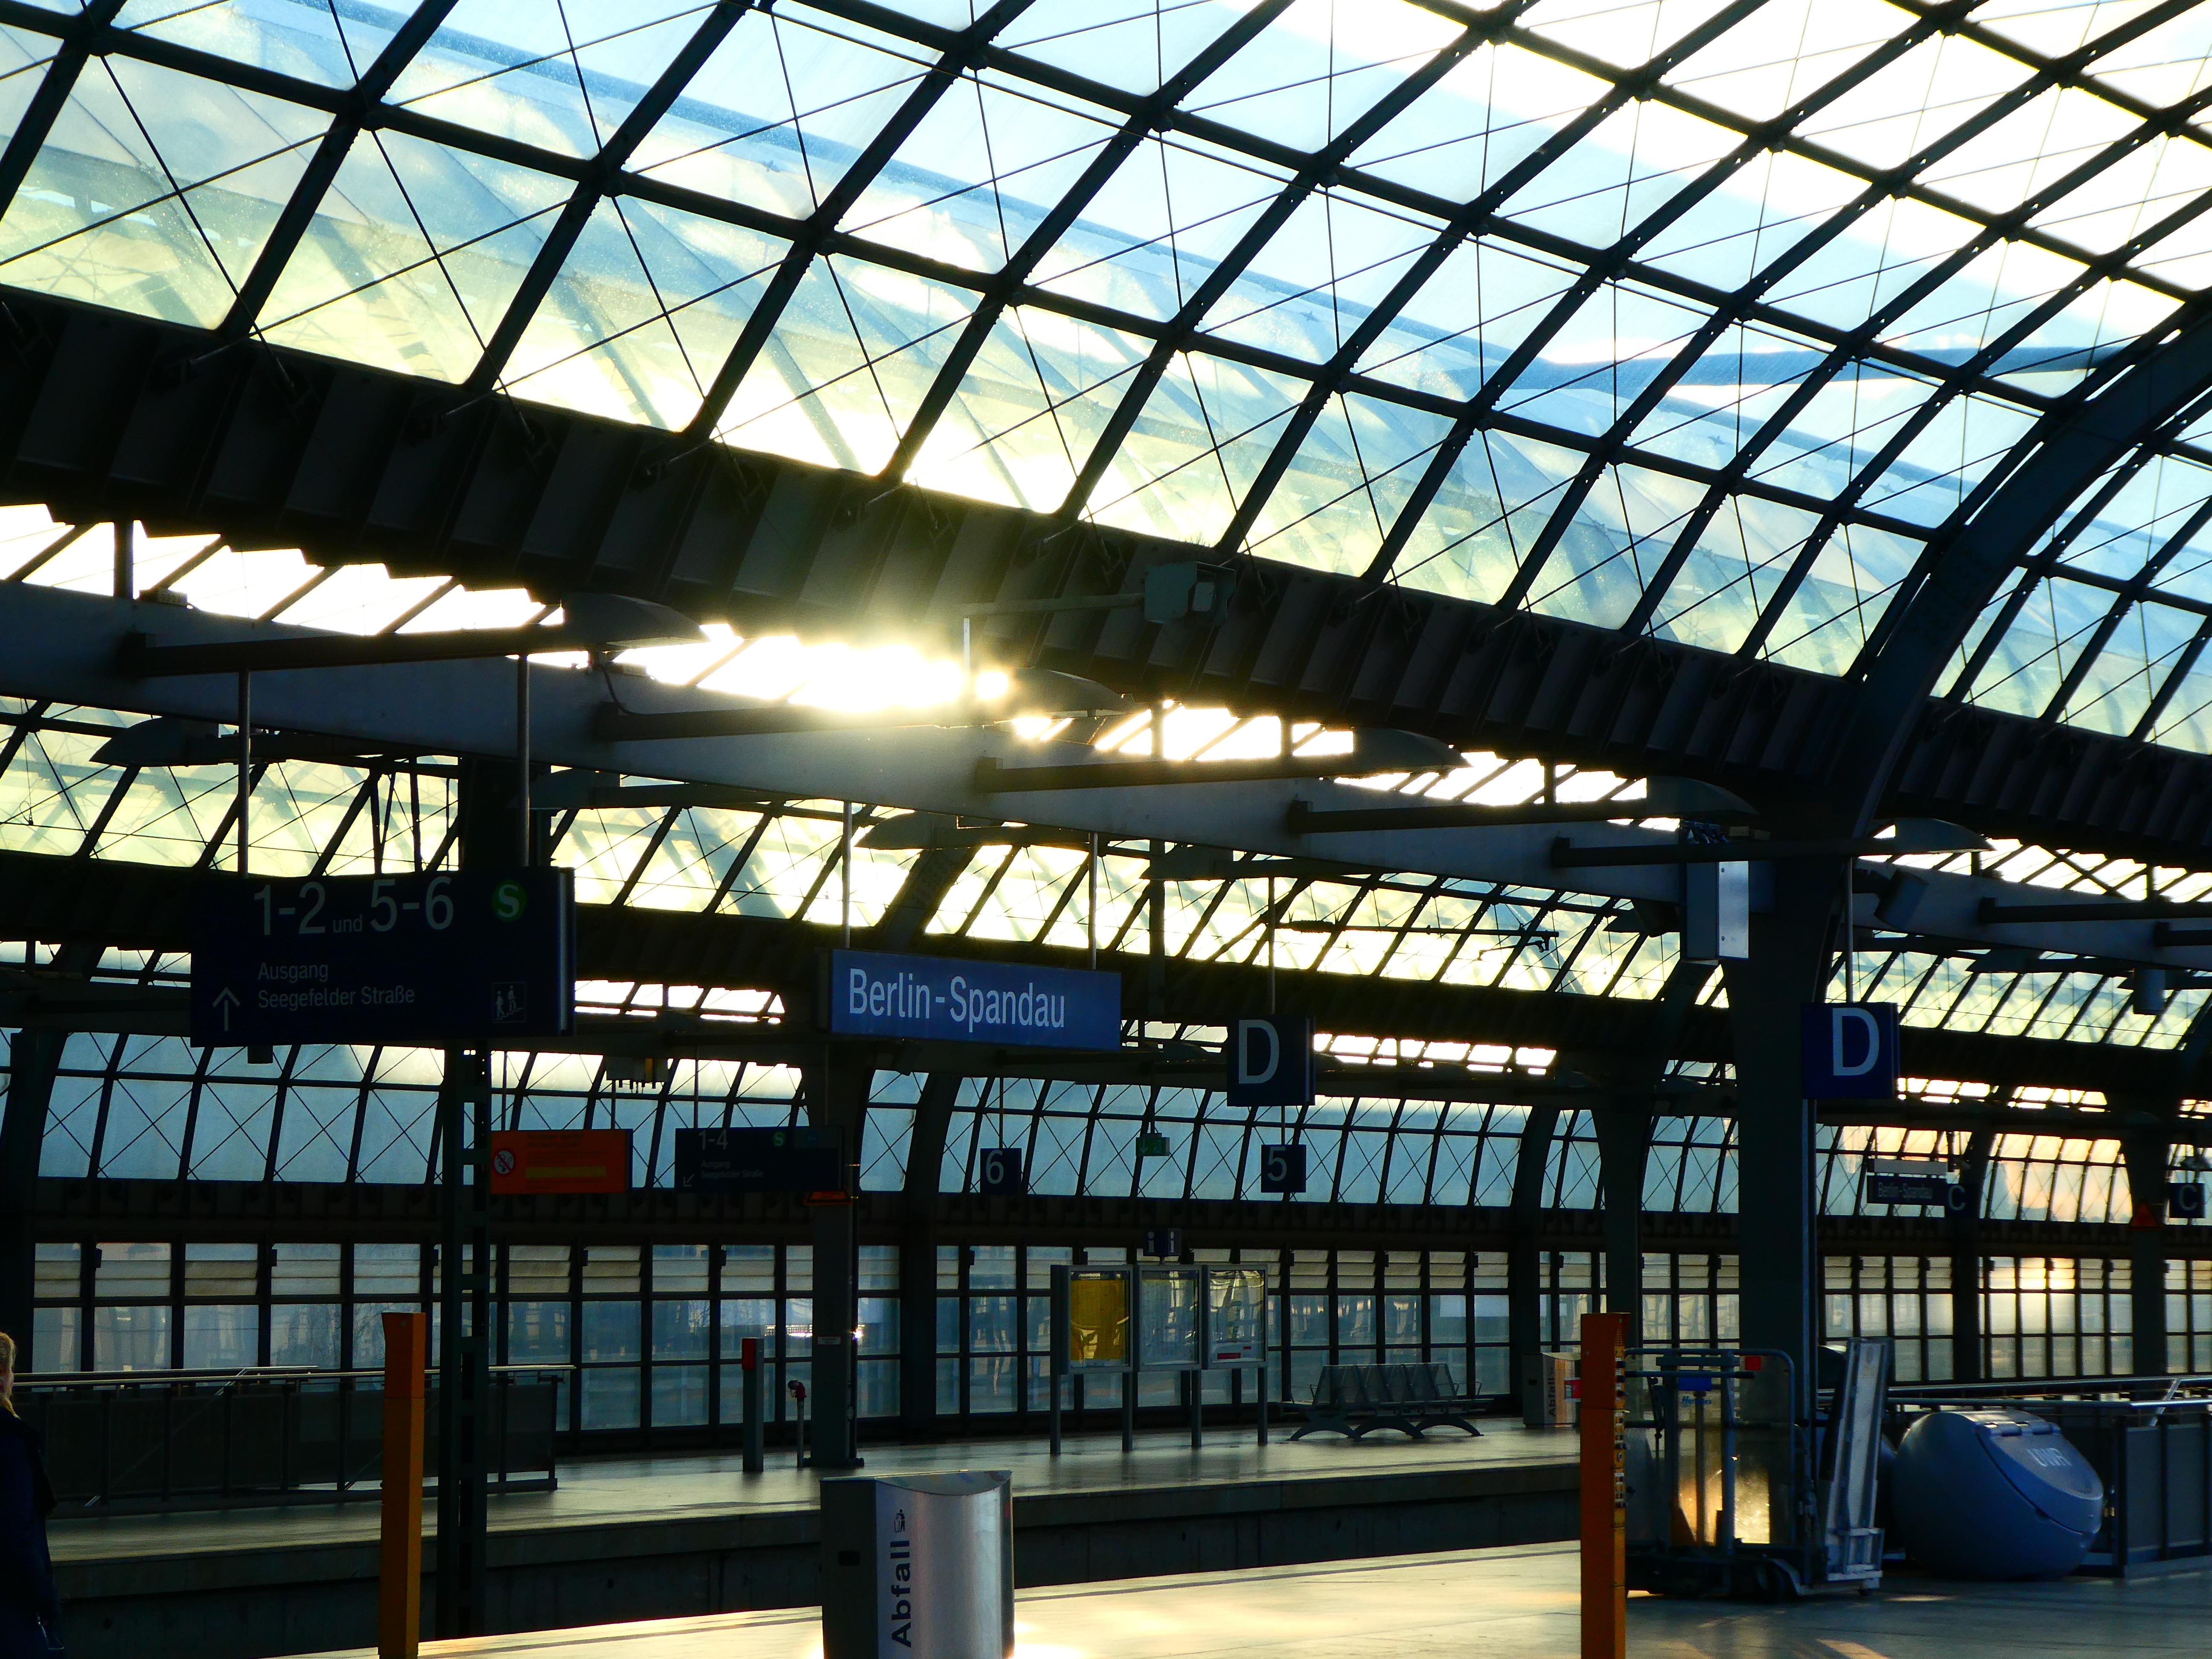 Kreuzfahrtterminal Spandau